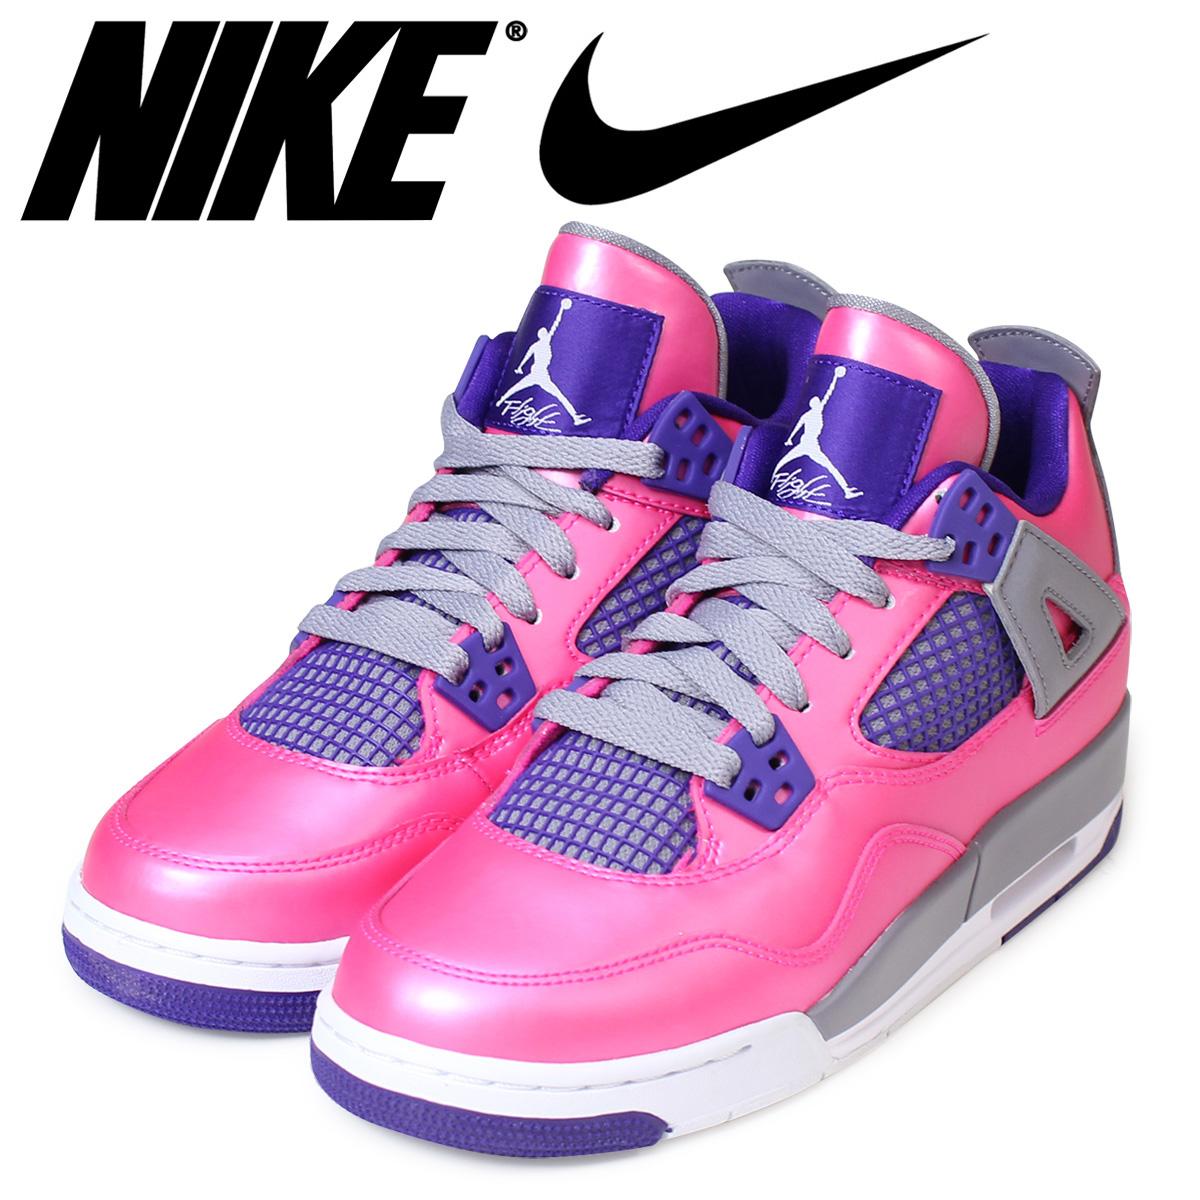 8a7ef946e06 Sugar Online Shop: NIKE Nike Air Jordan sneakers Lady's AIR JORDAN 4 RETRO  GS Air Jordan 4 nostalgic 487,724-607 shoes pink | Rakuten Global Market